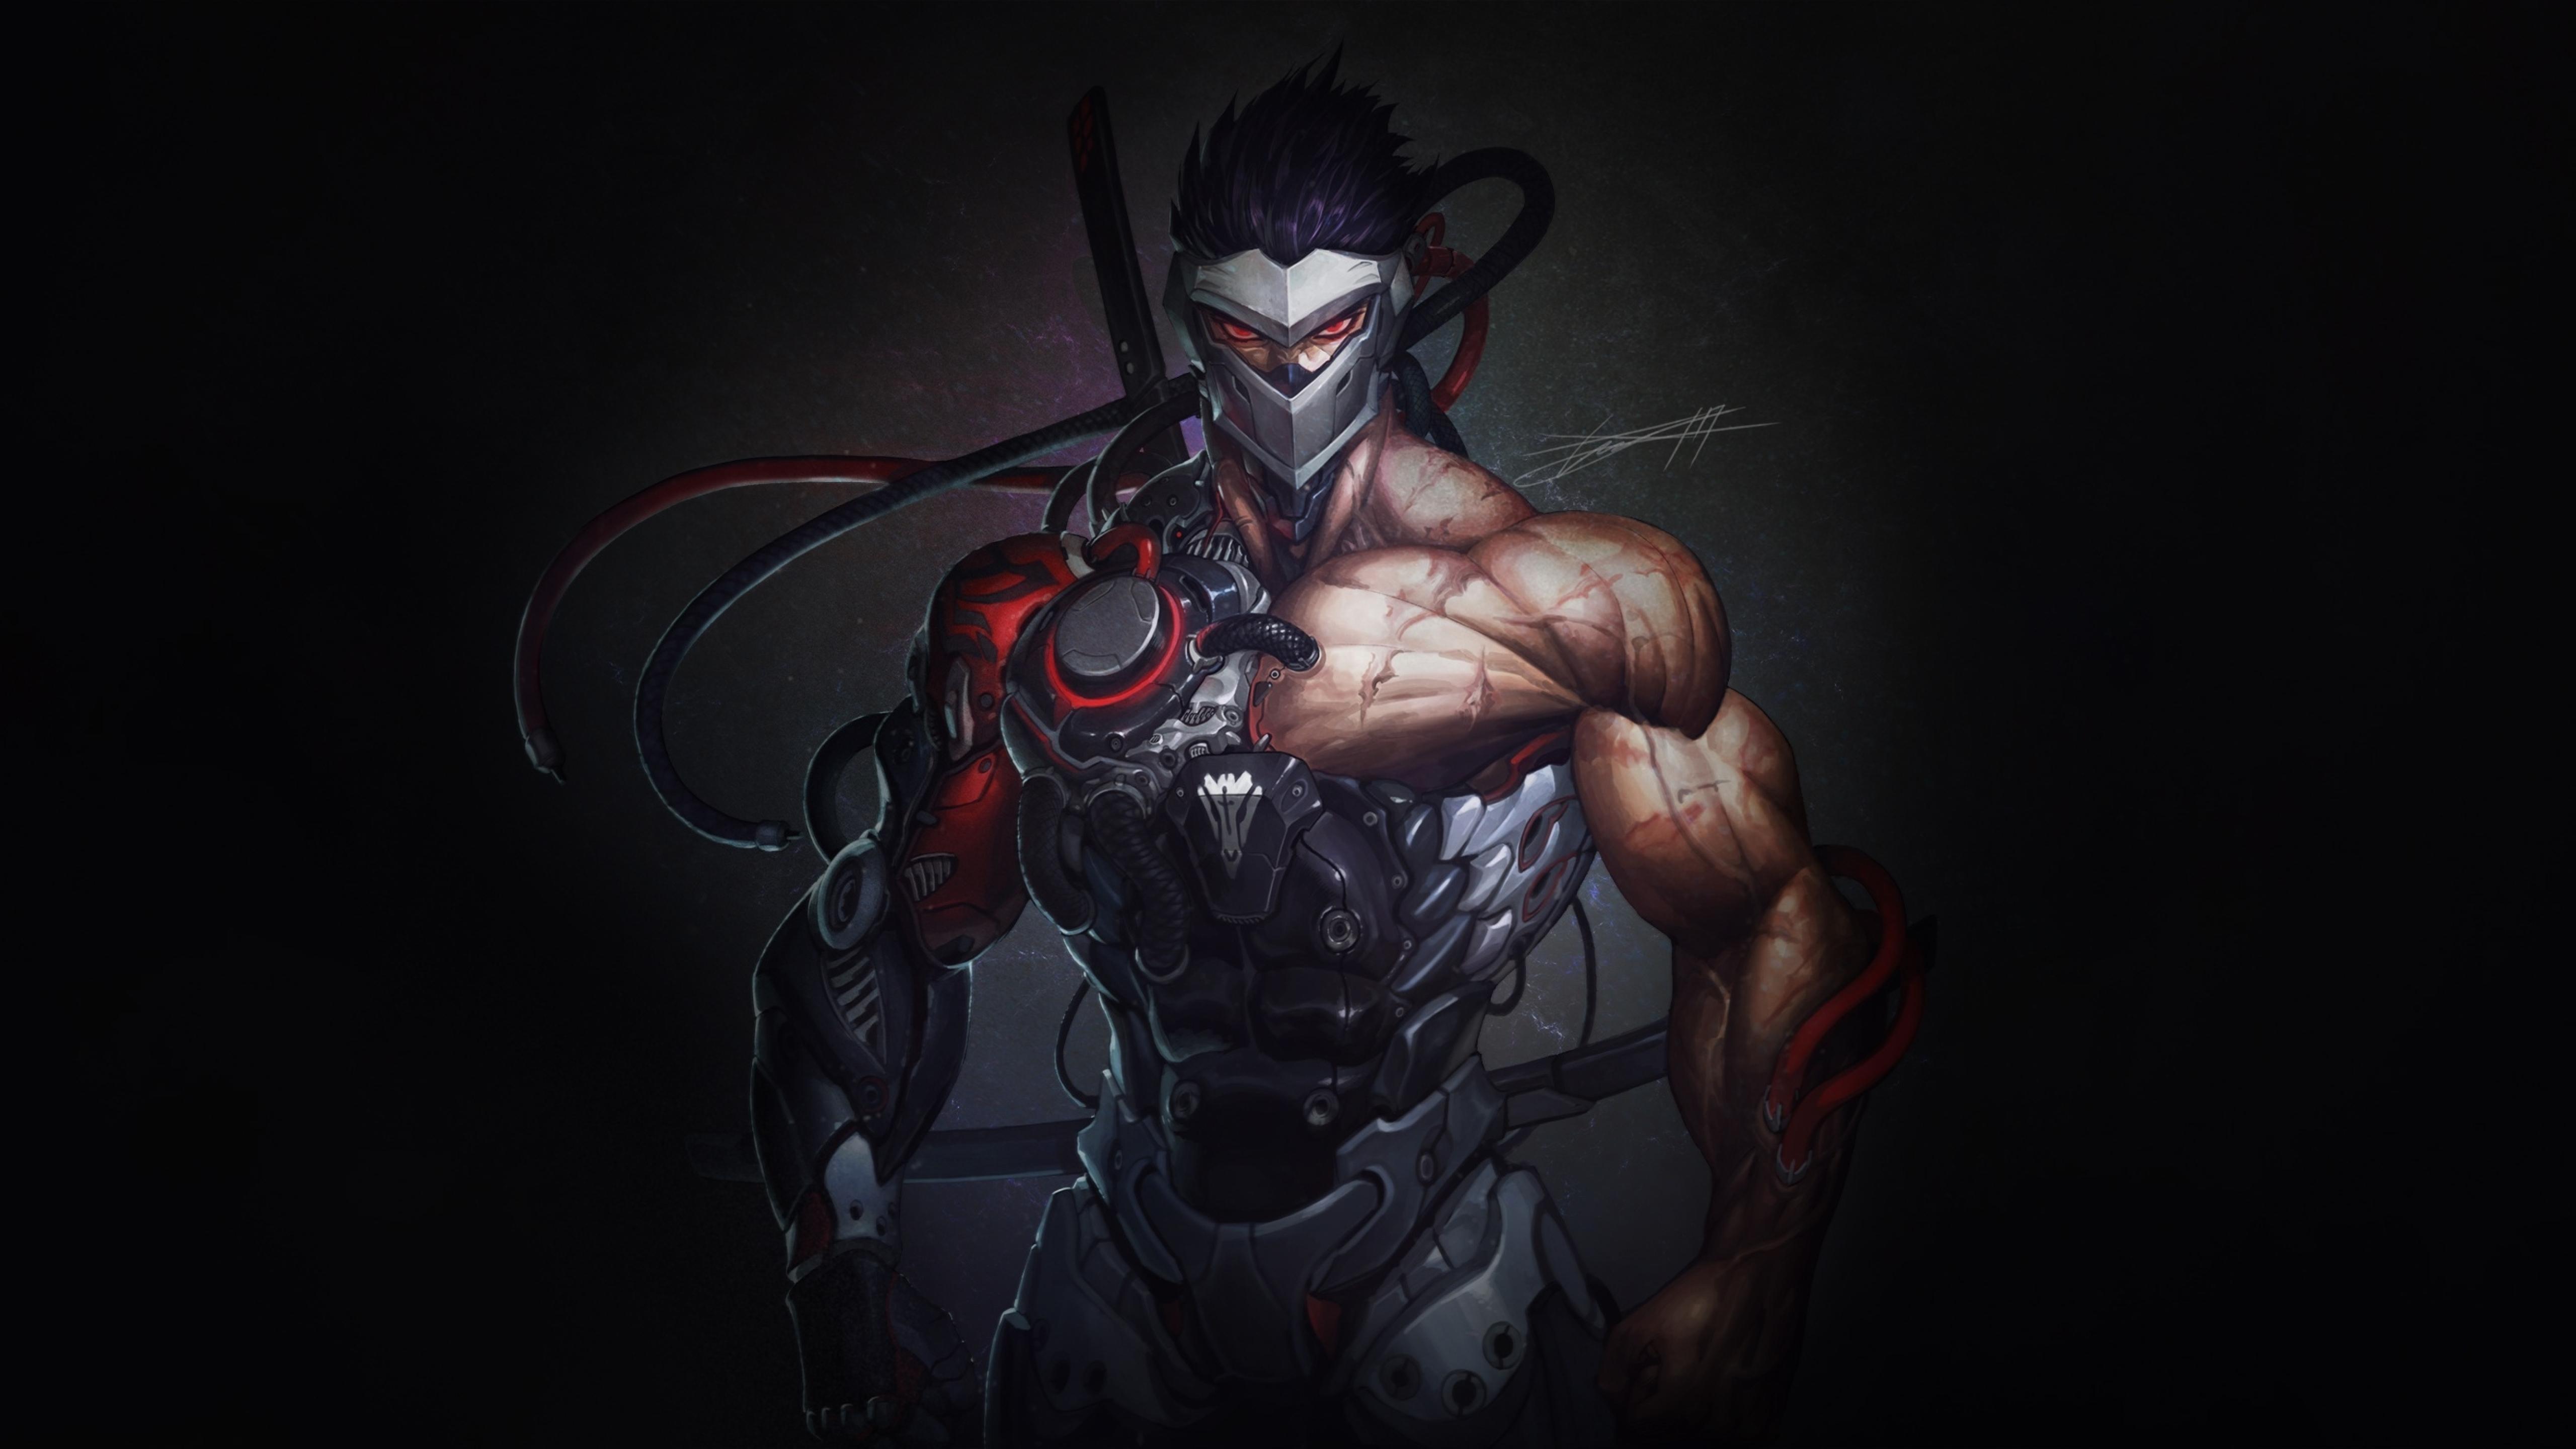 Cyborg Overwatch Genji 5K Wallpaper